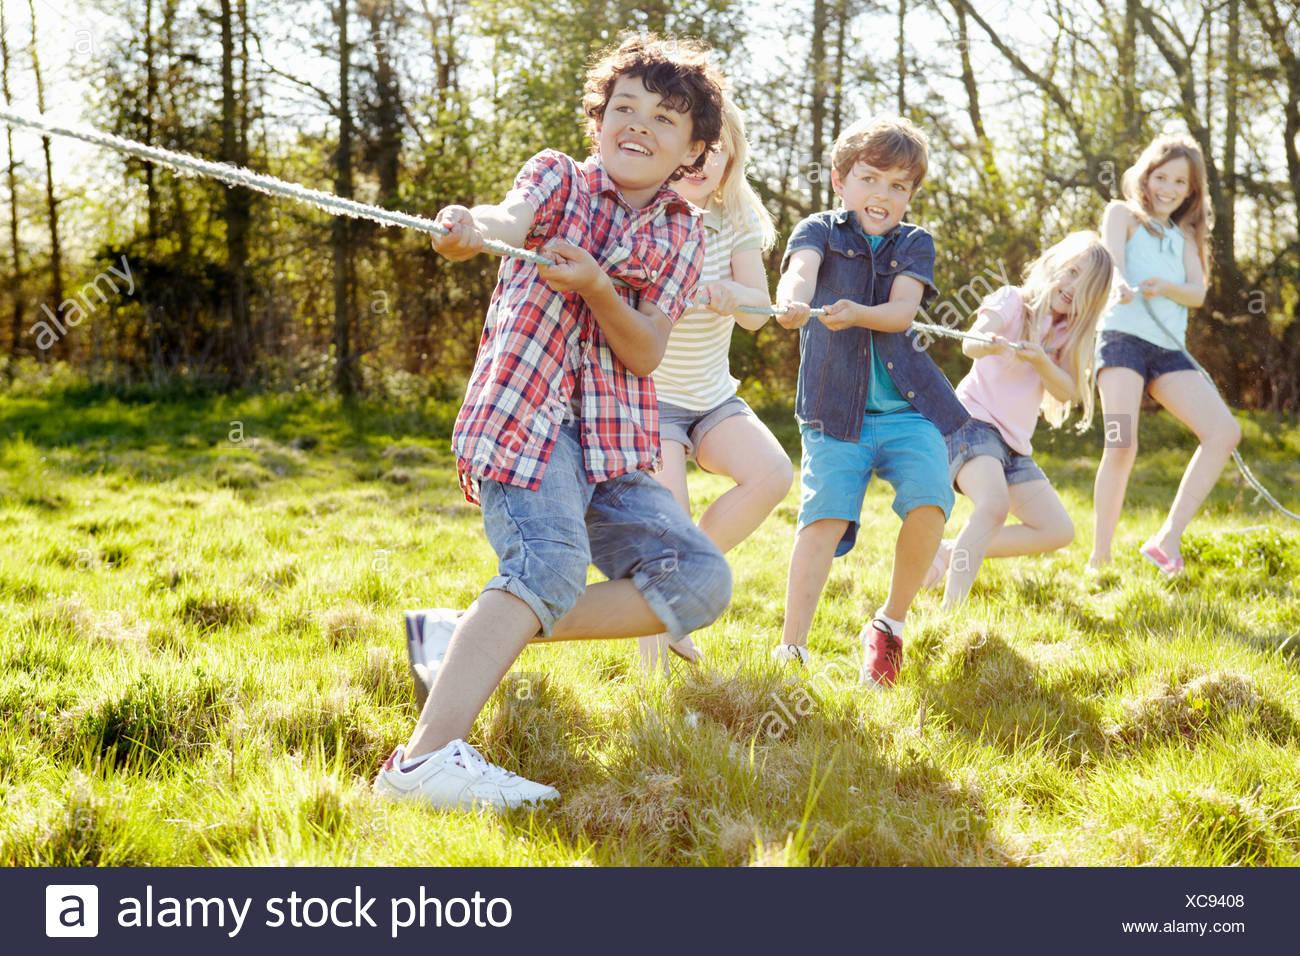 Group of young children playing tug o war - Stock Image